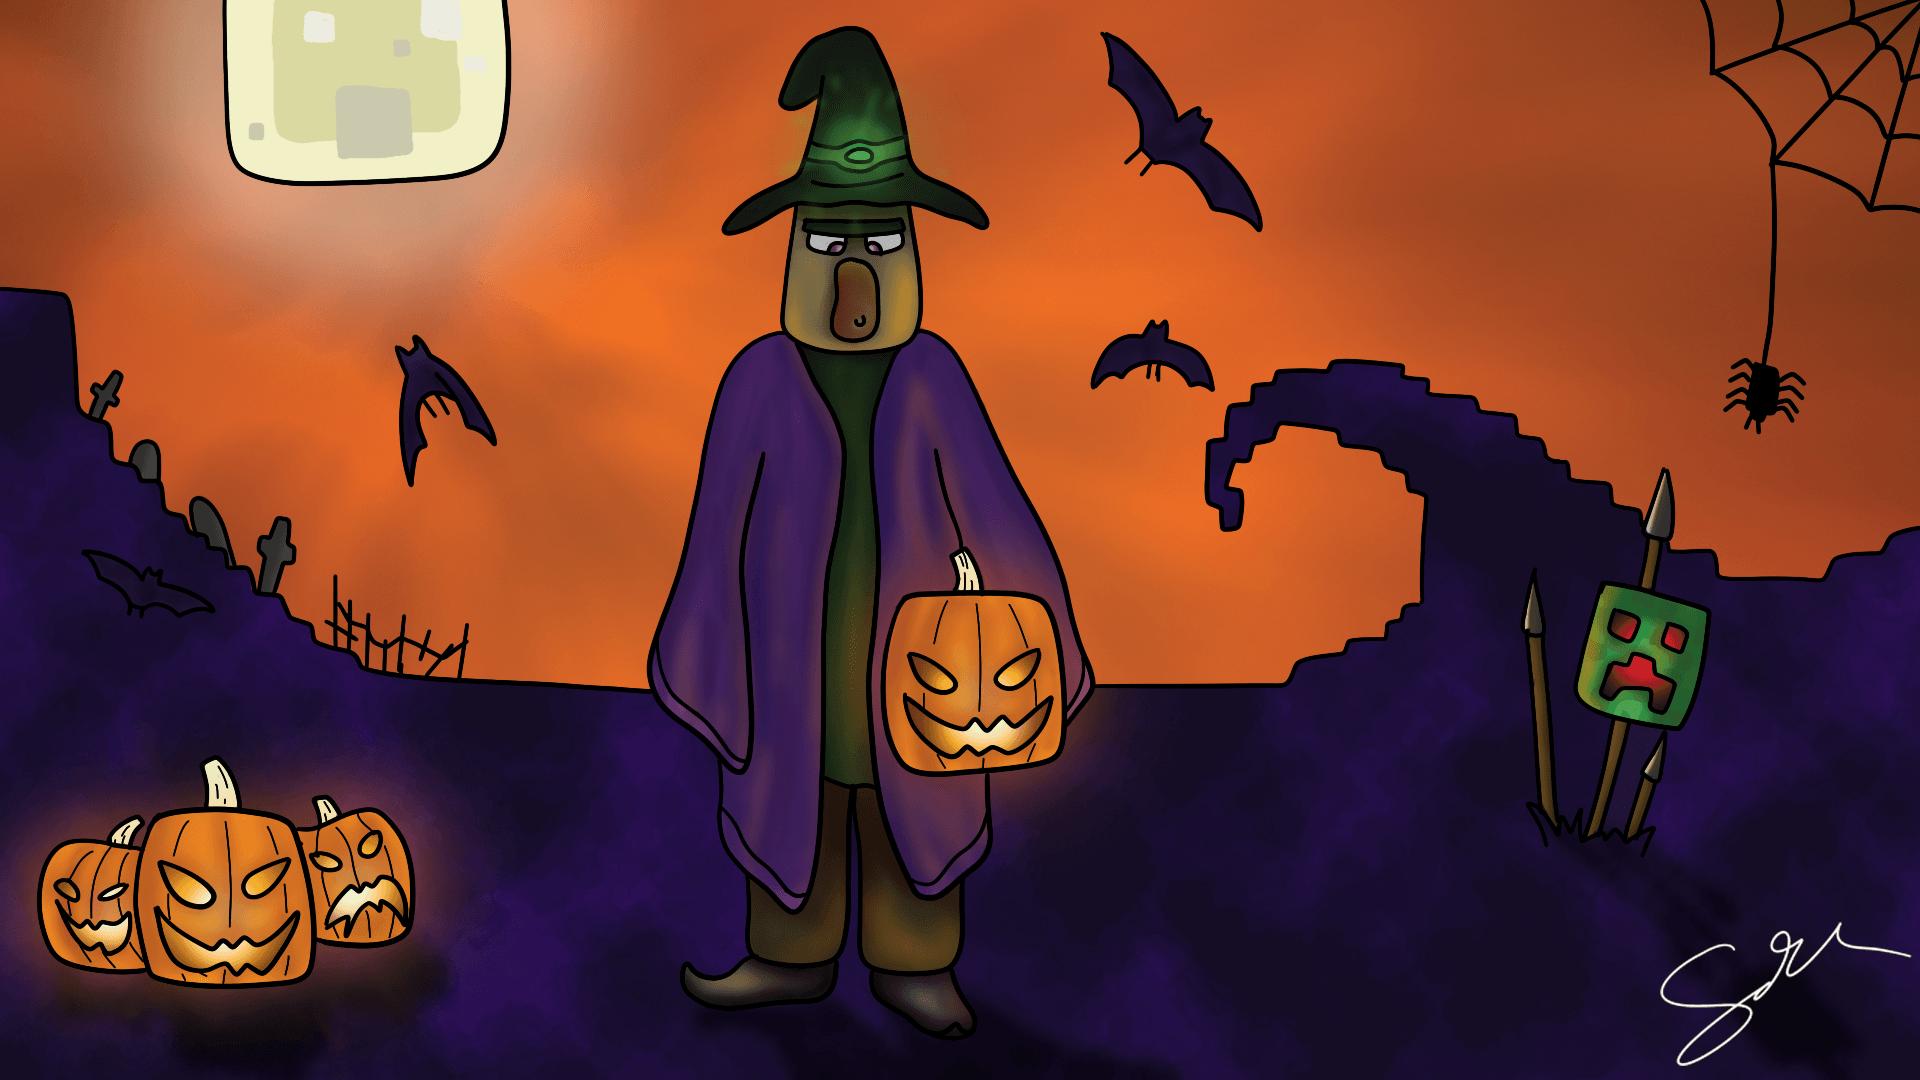 minecraft_halloween_by_goldsolace-d5jcmxm